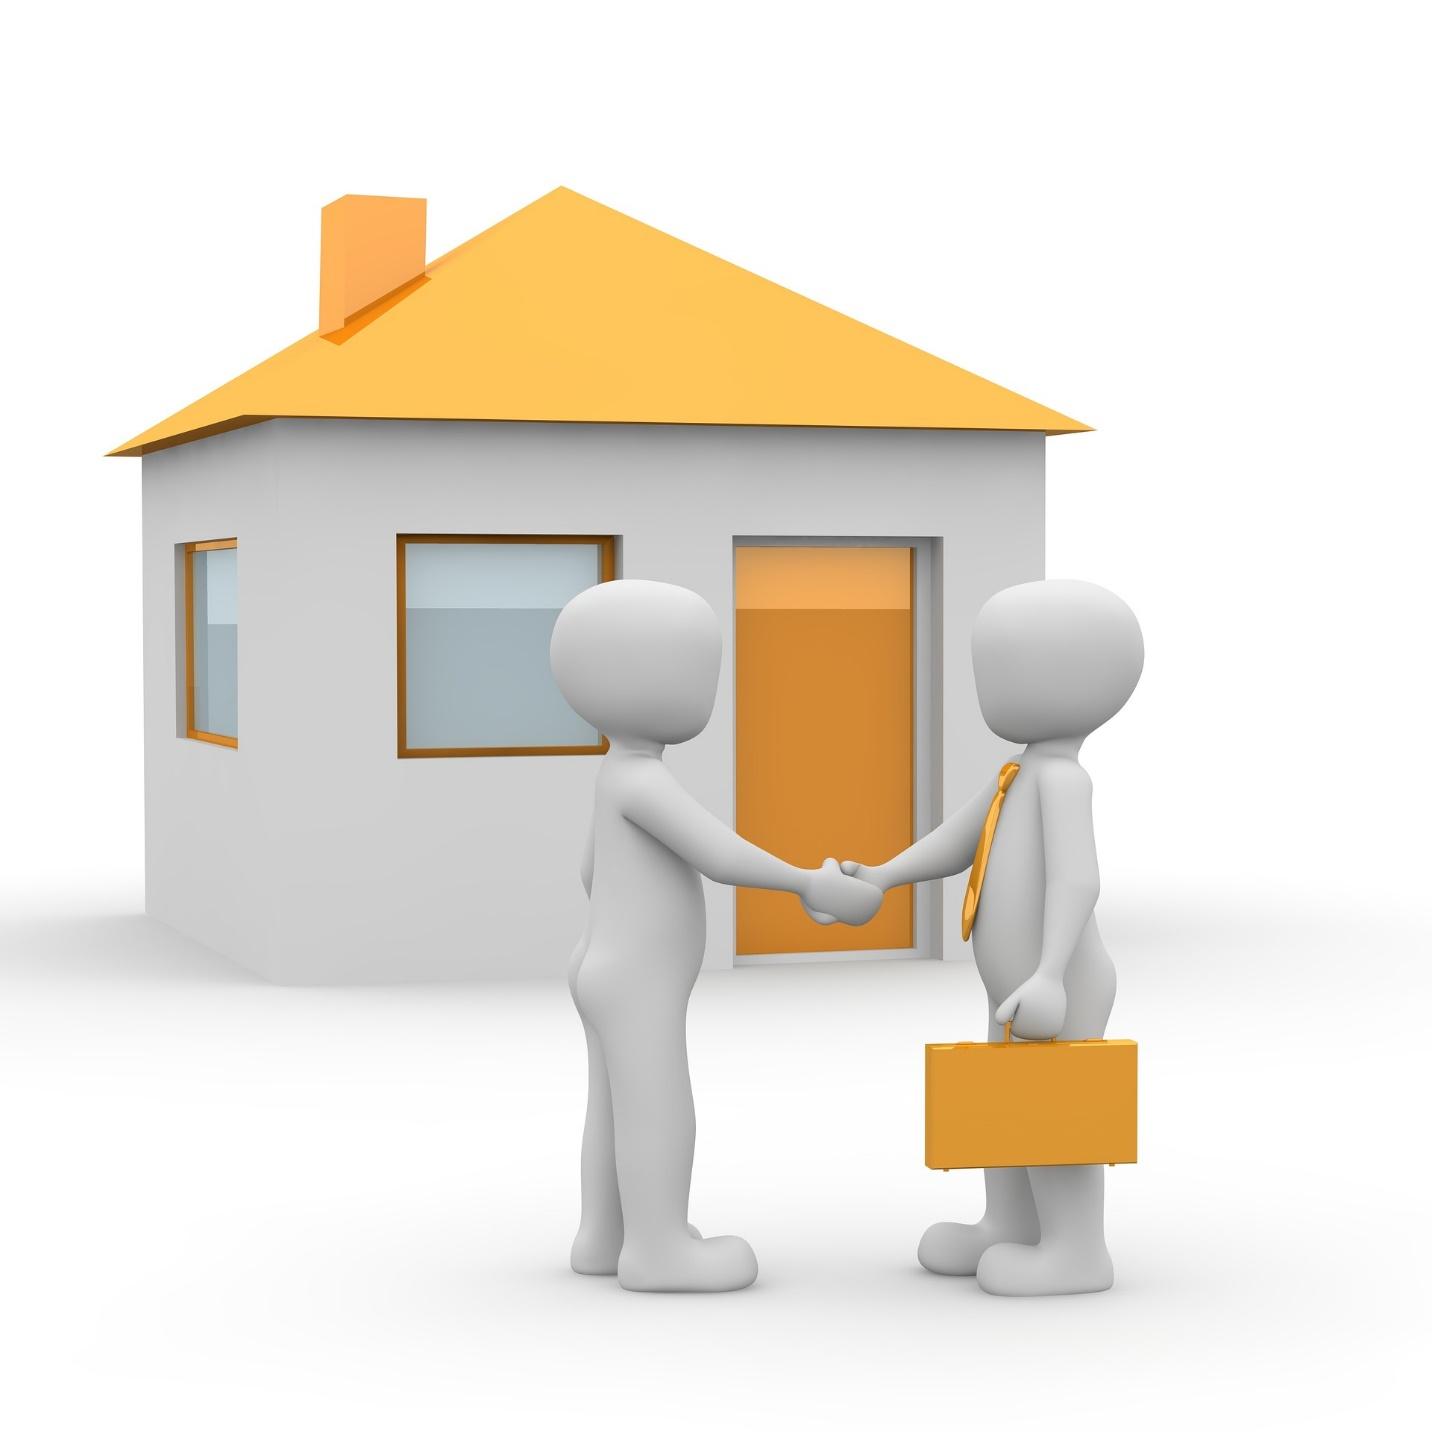 C:\Users\Bala\Downloads\house-purchase-1019764_1920.jpg